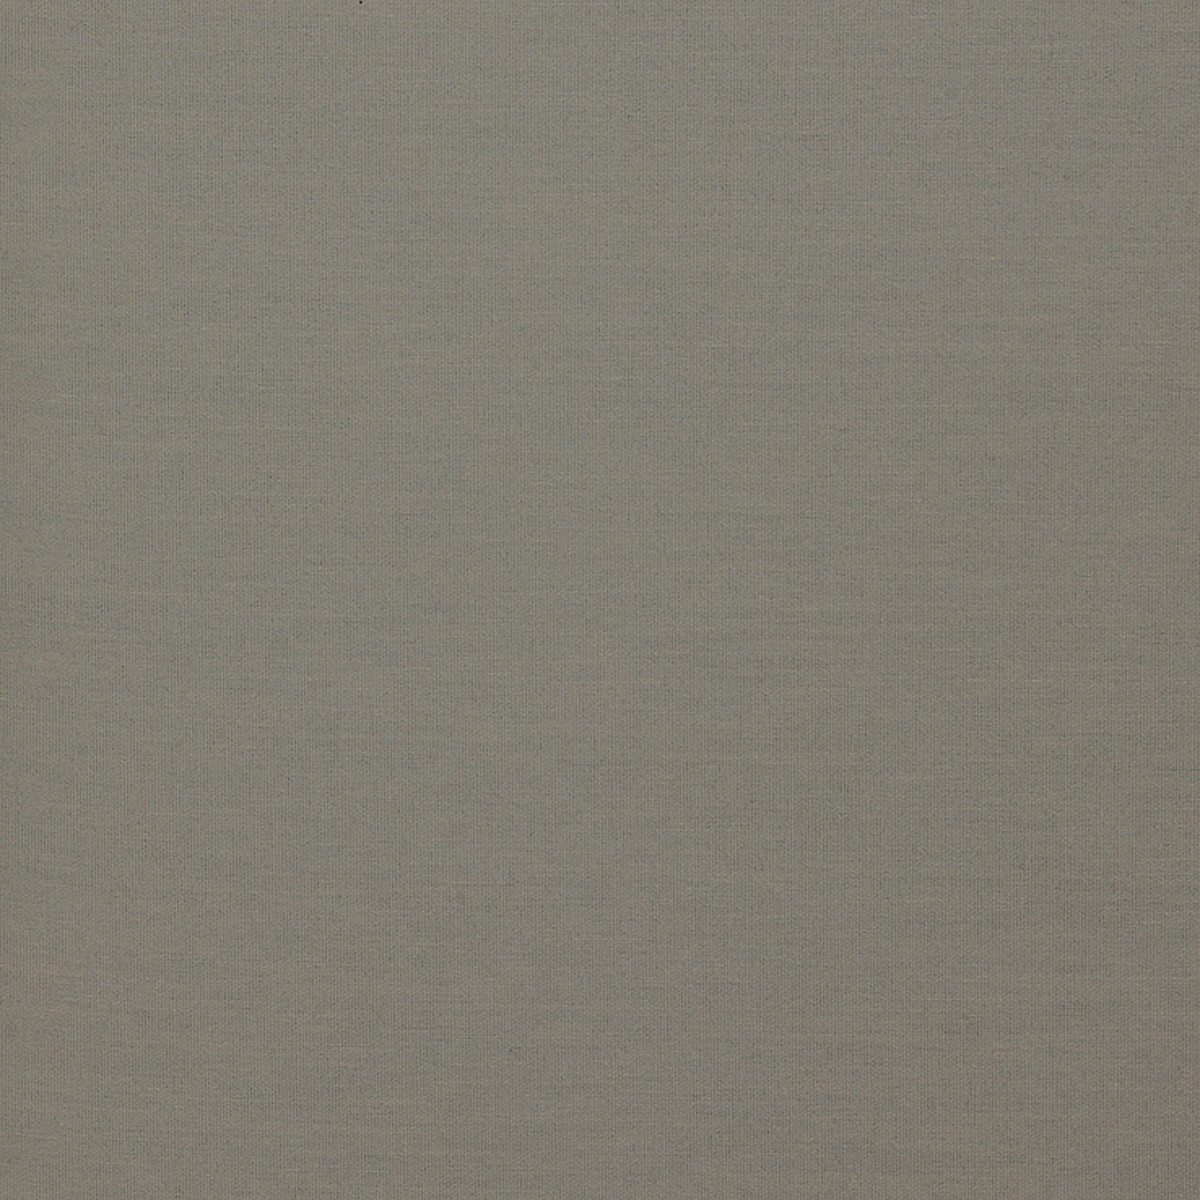 Rullgardinsväv Carina color blackout 7929